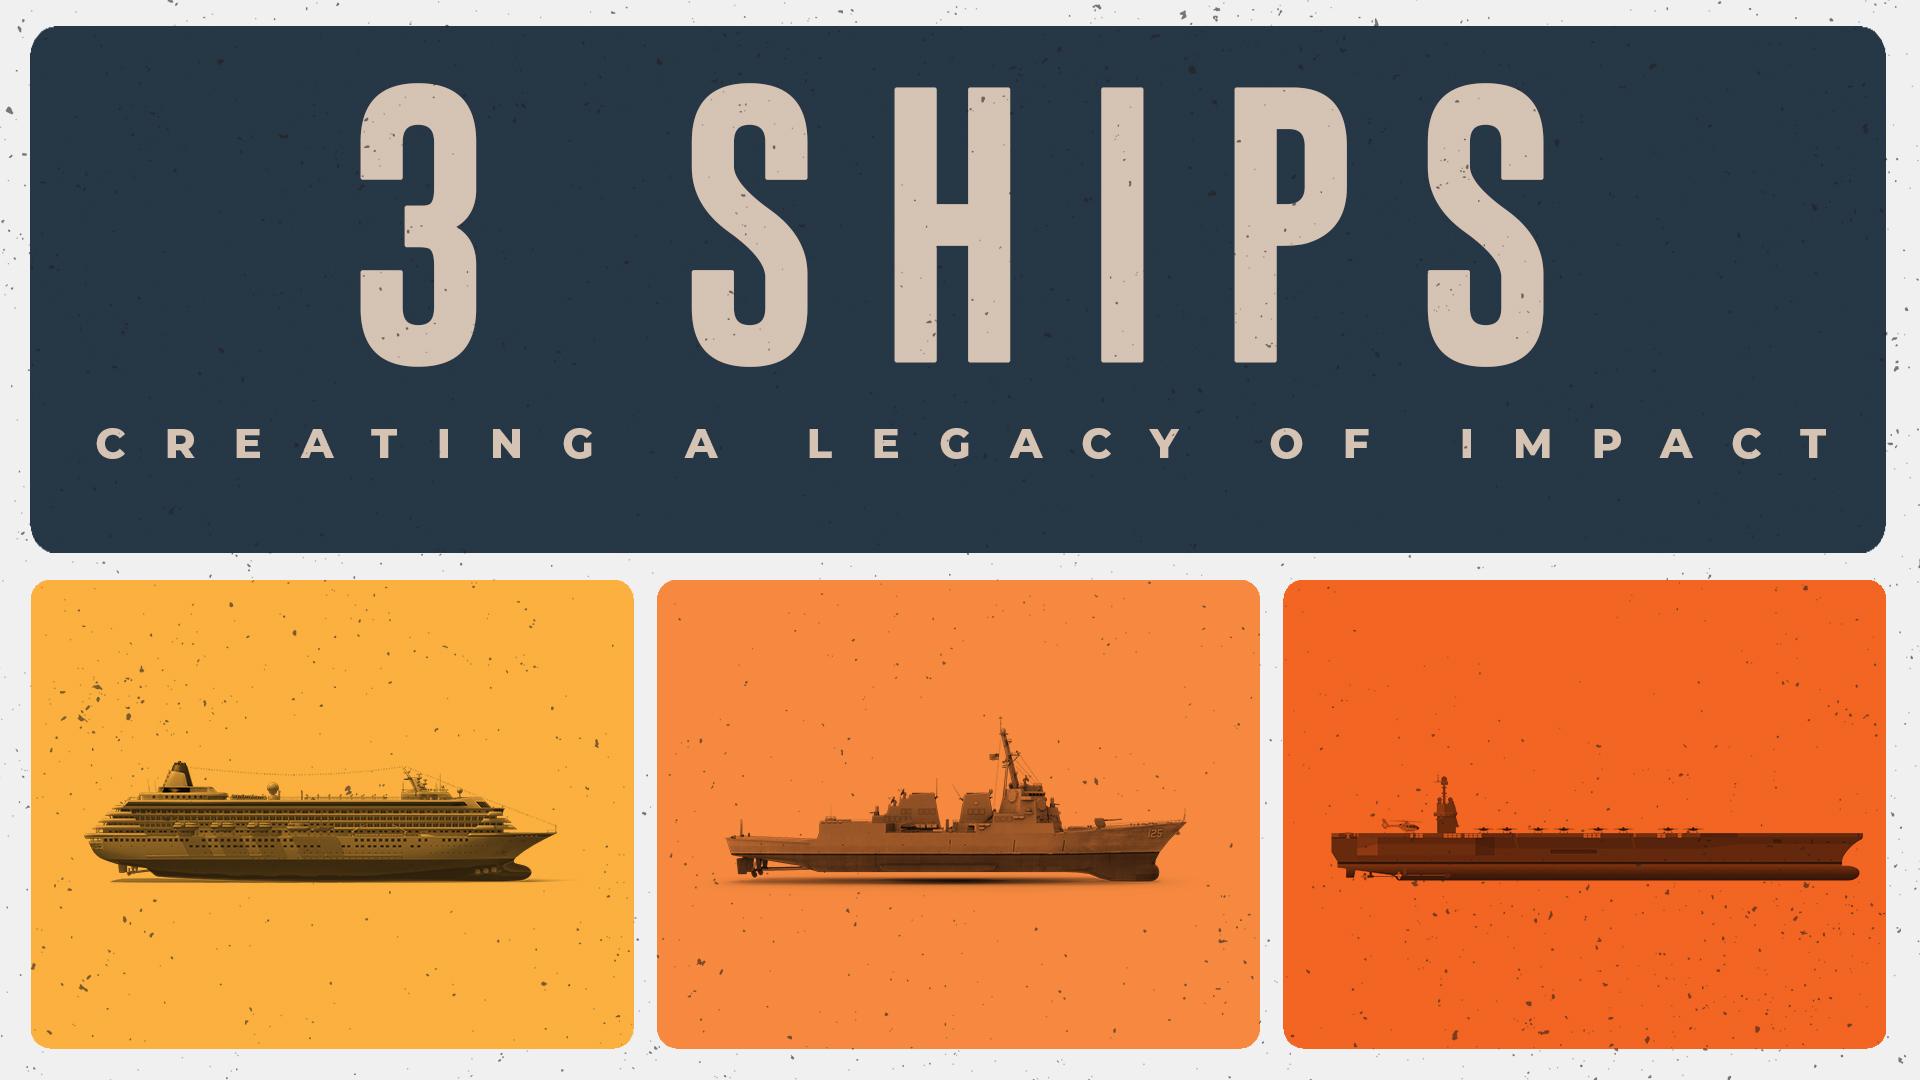 3 Ships-21920x1080px.jpg